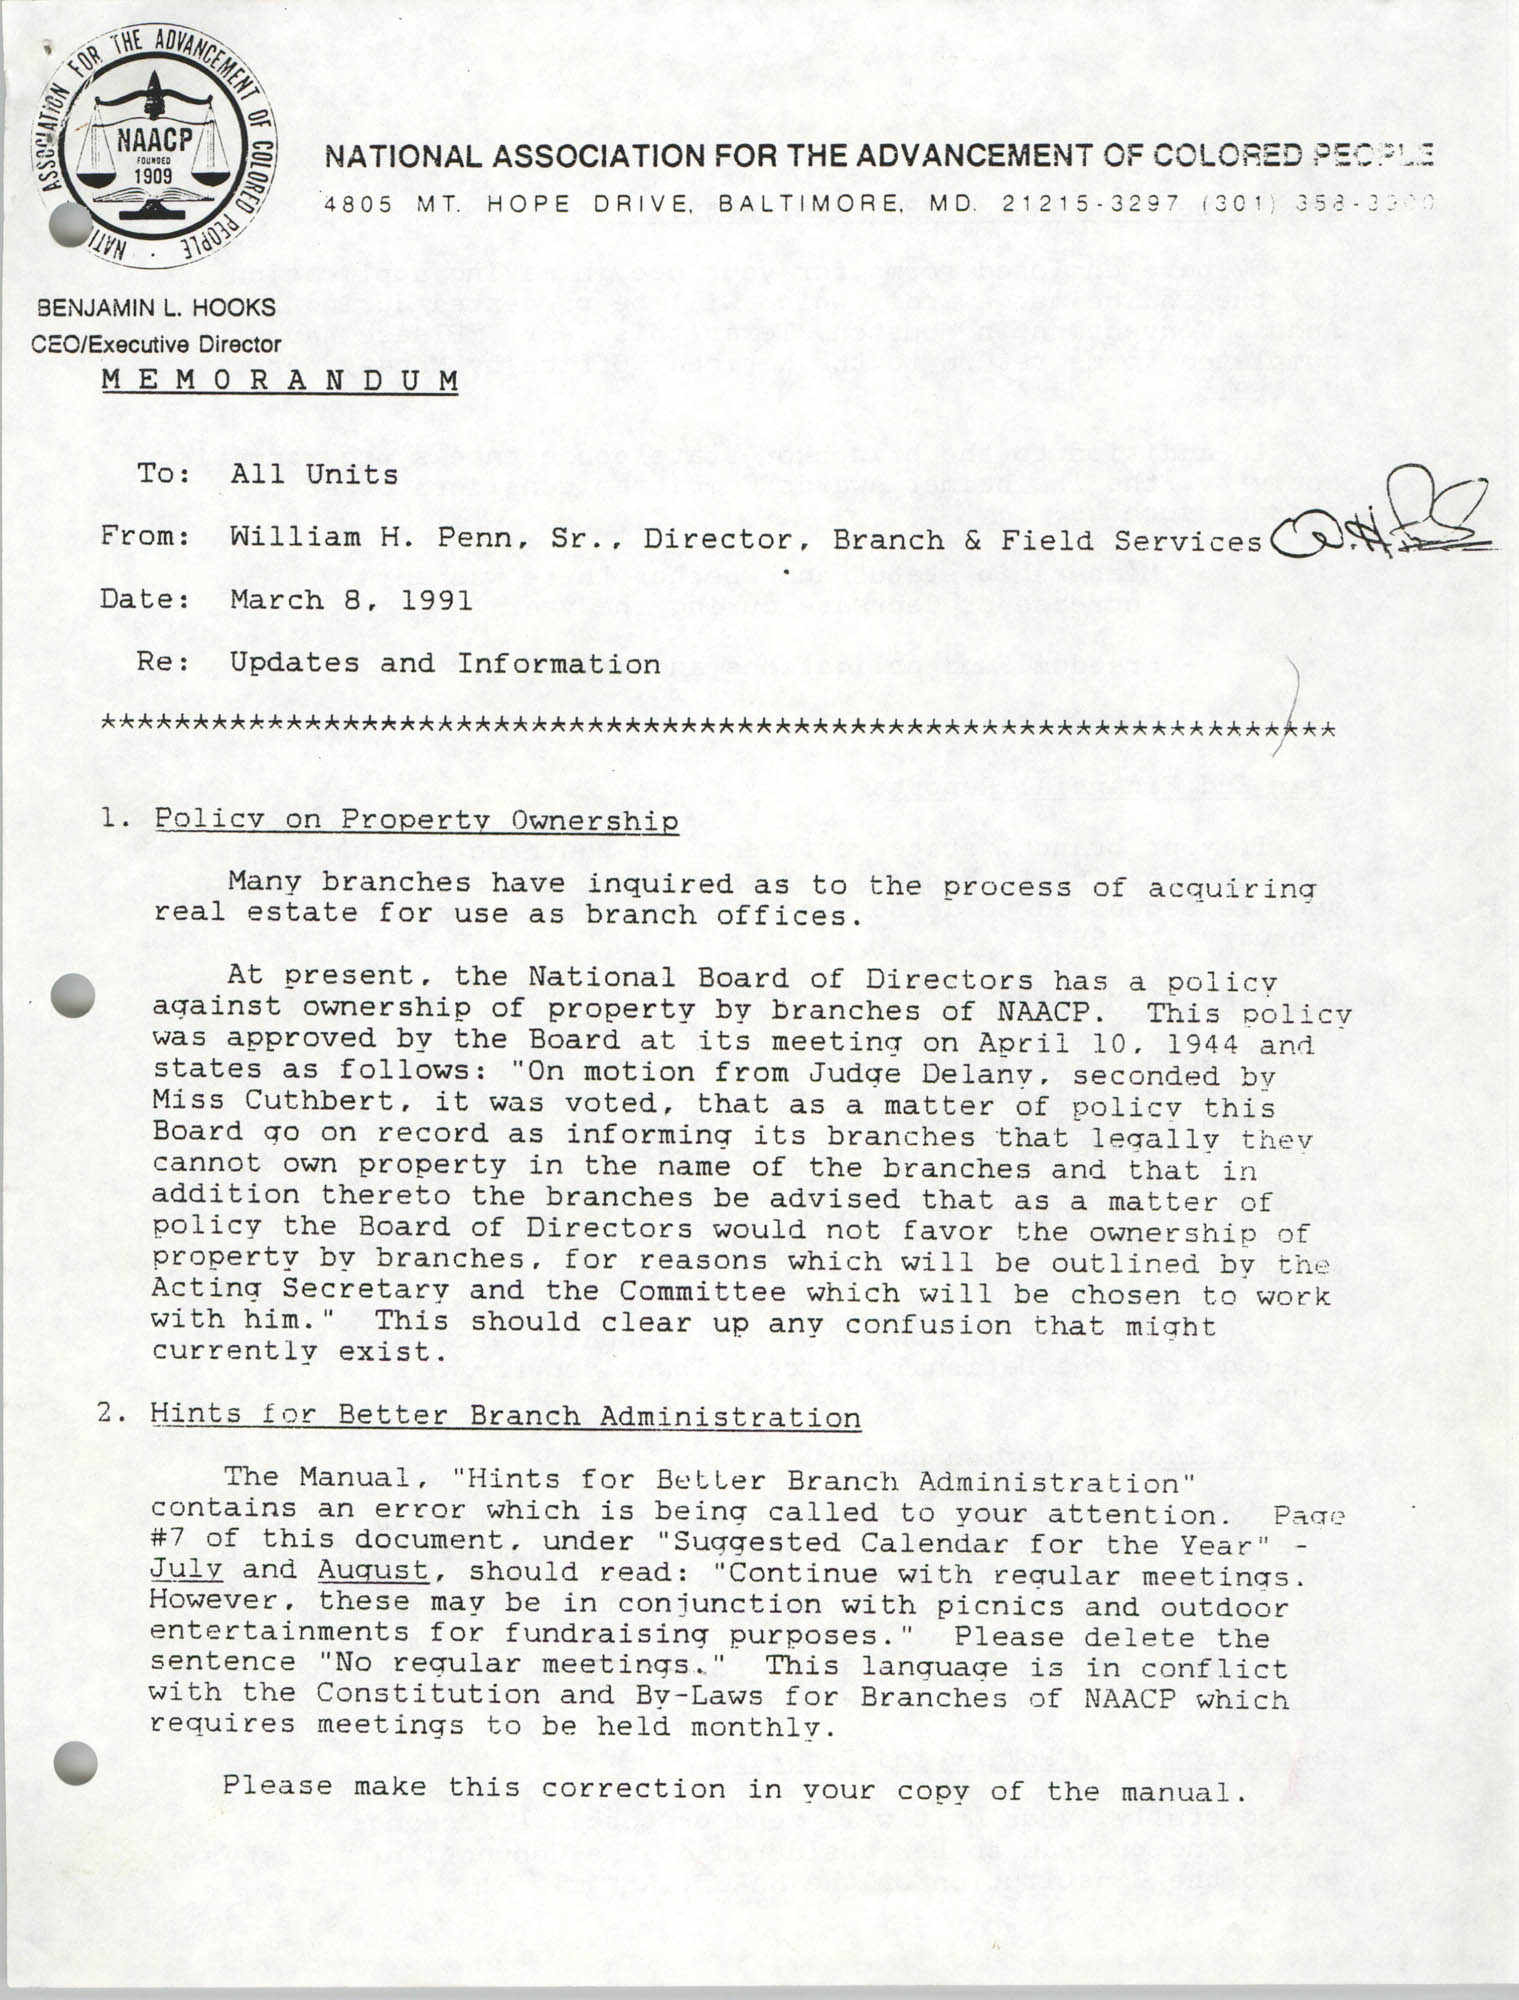 NAACP Memorandum, March 8, 1991